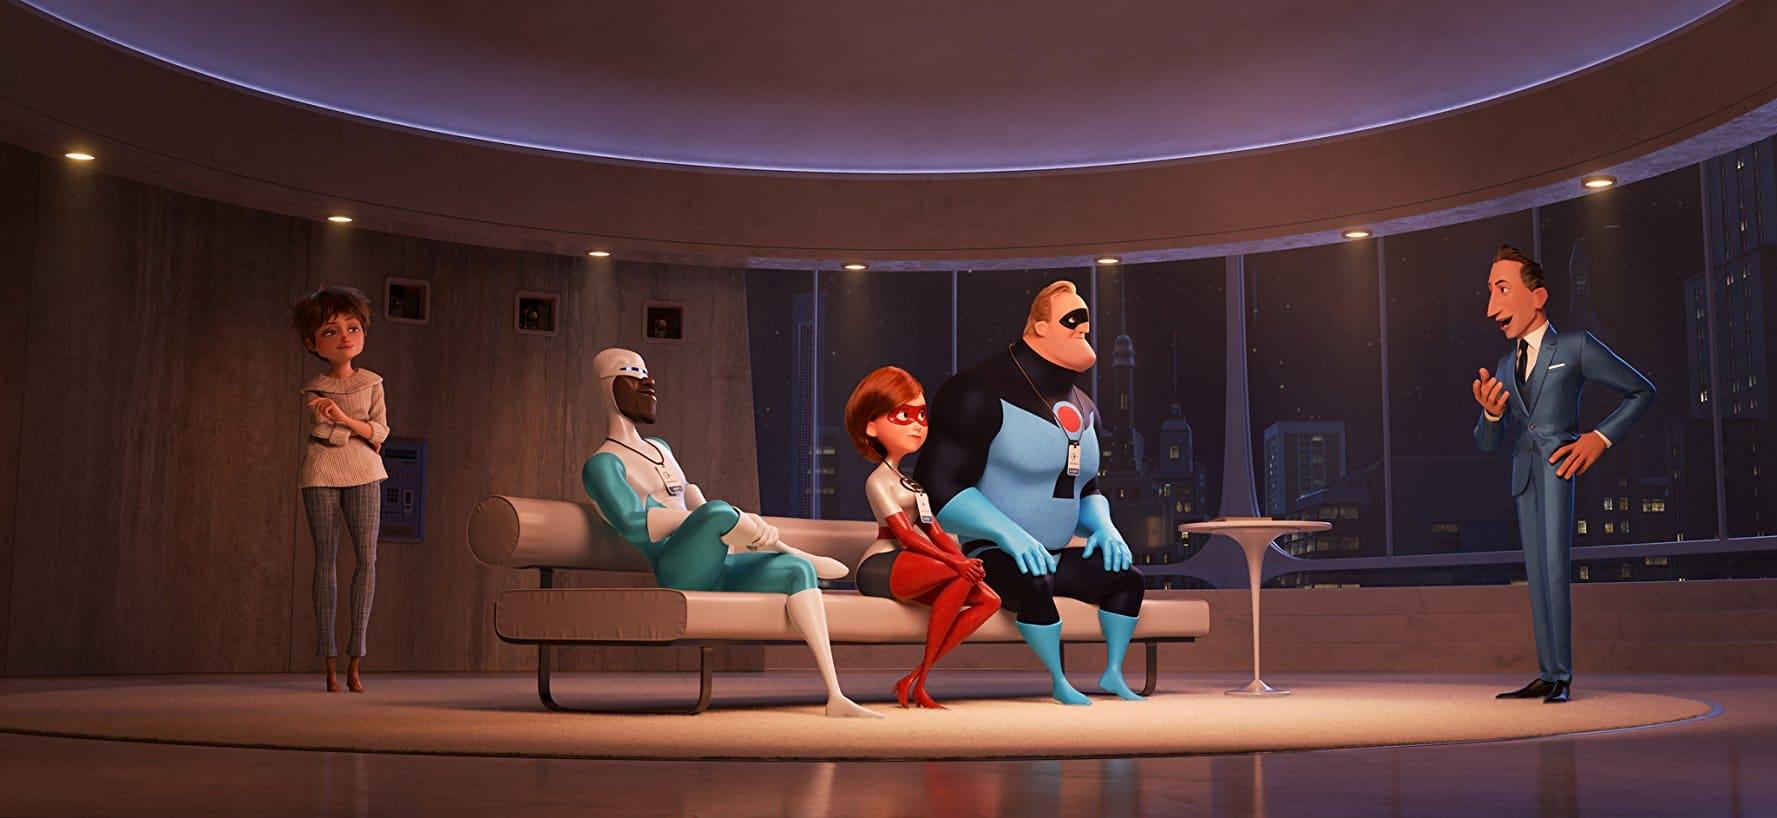 Les Indestructibles 2 avec Frozone, Elastigirl, Evelyn Deavor